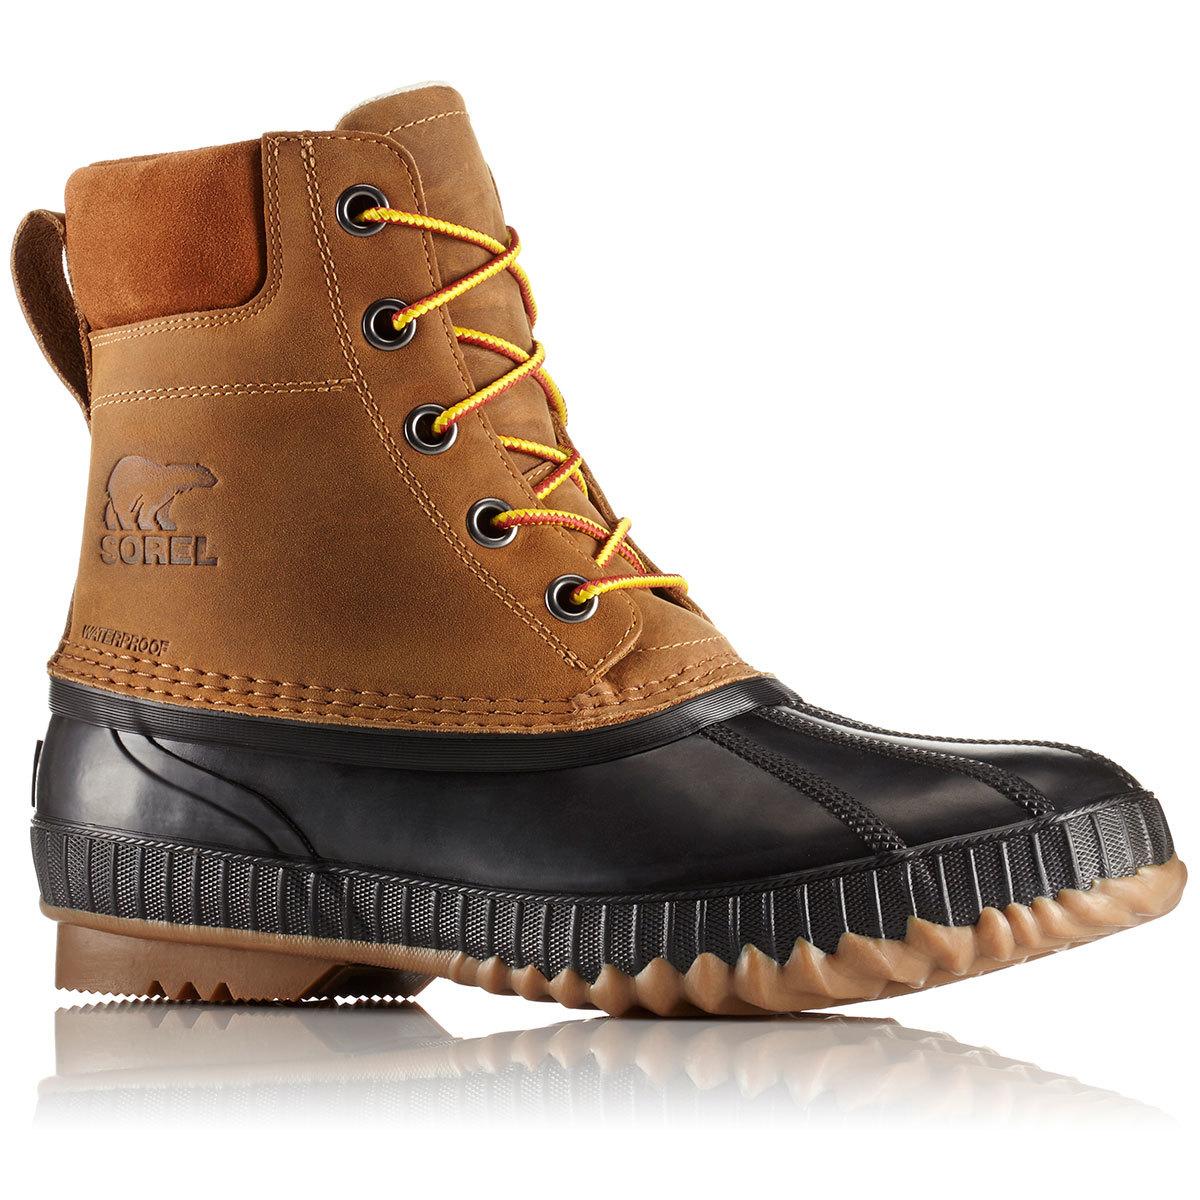 Sorel Men's 8 In. Cheyanne Ii Lace-Up Waterproof Duck Boots, Chipmunk - Brown, 14